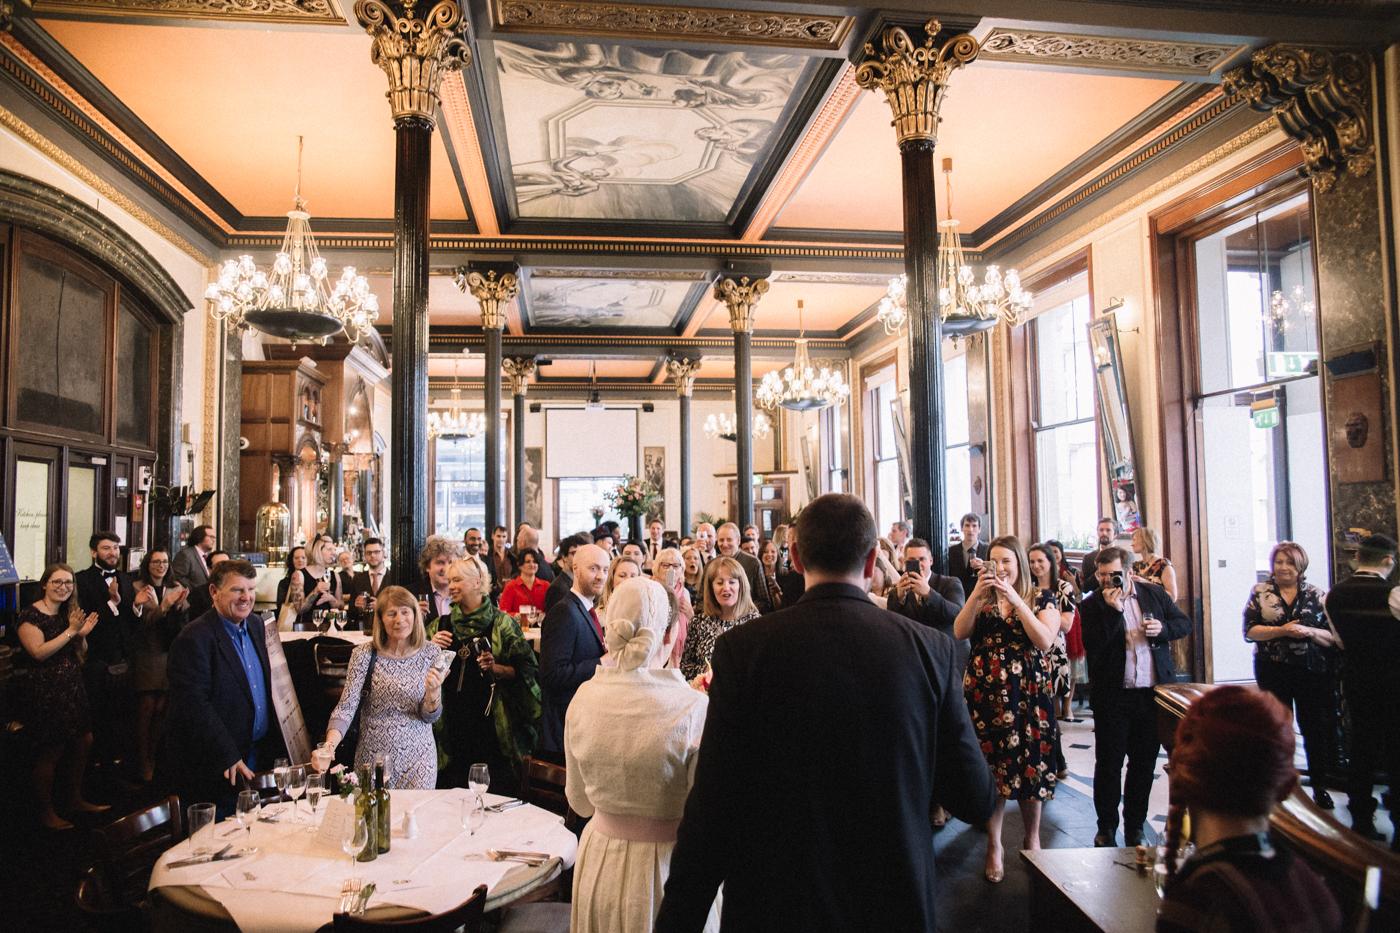 knights-templar-london-city-centre-wedding-photographer-charing-cross-creative-0027.jpg